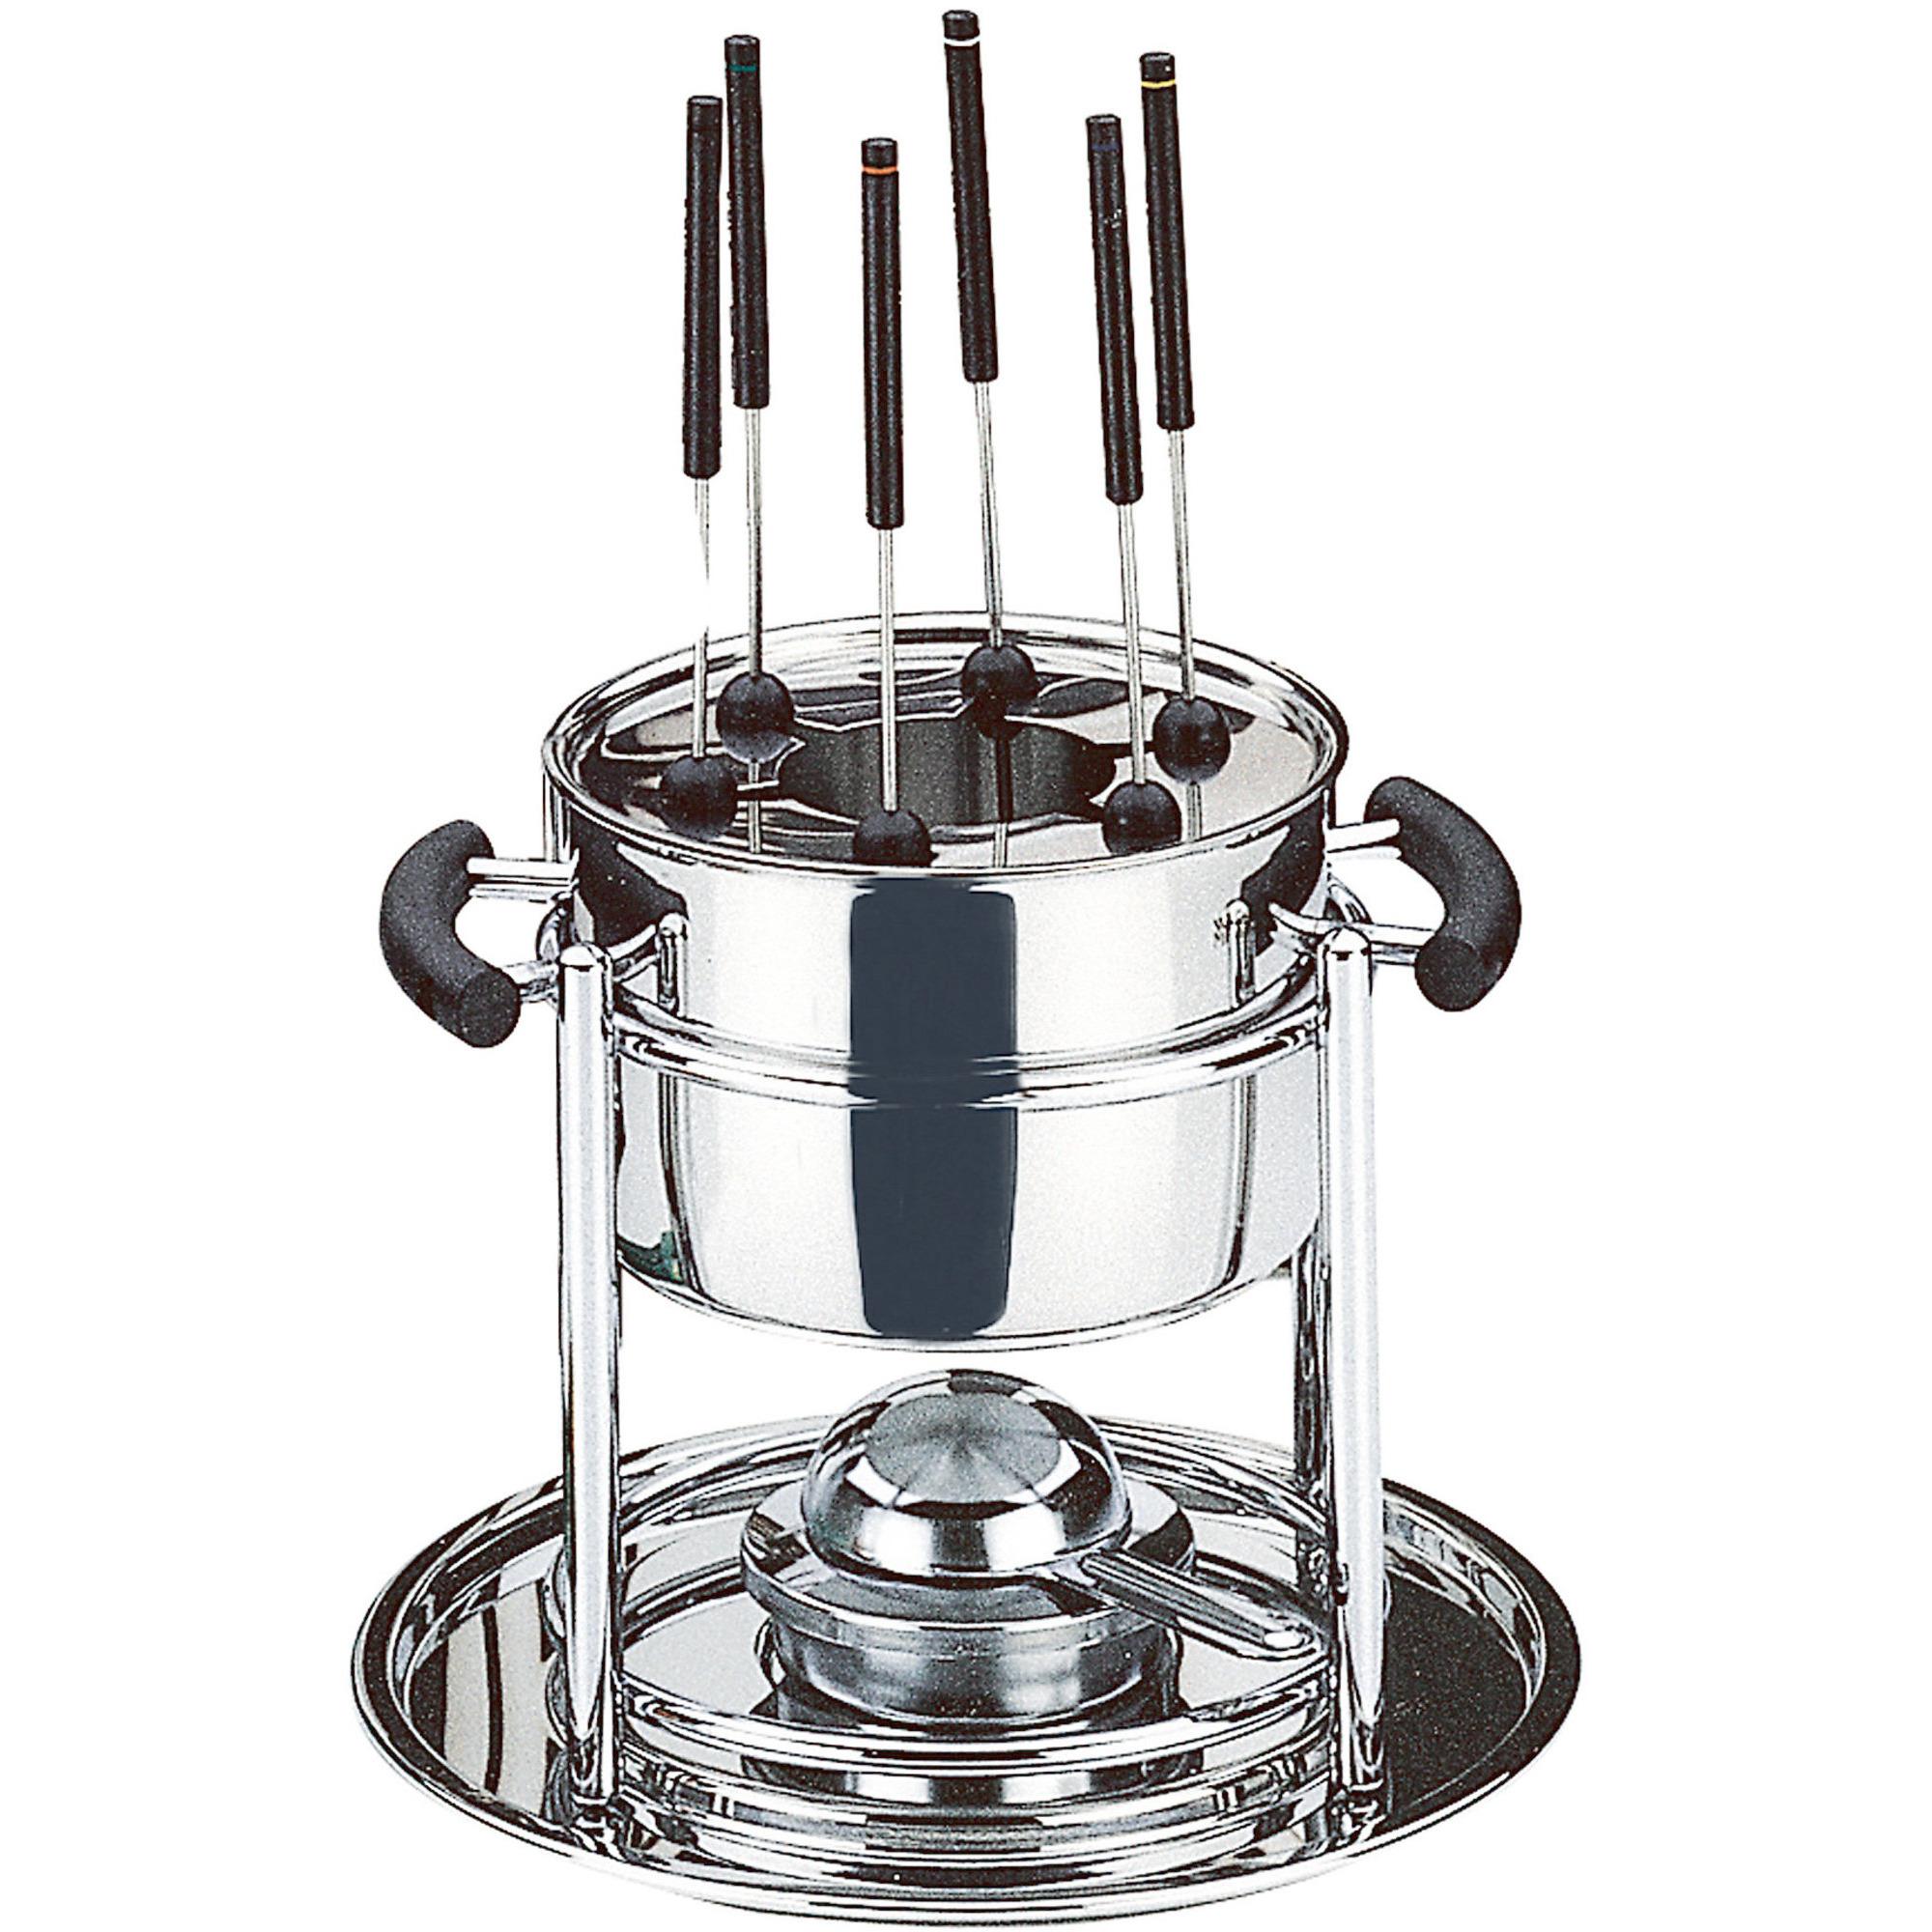 WMF Allegro fondue